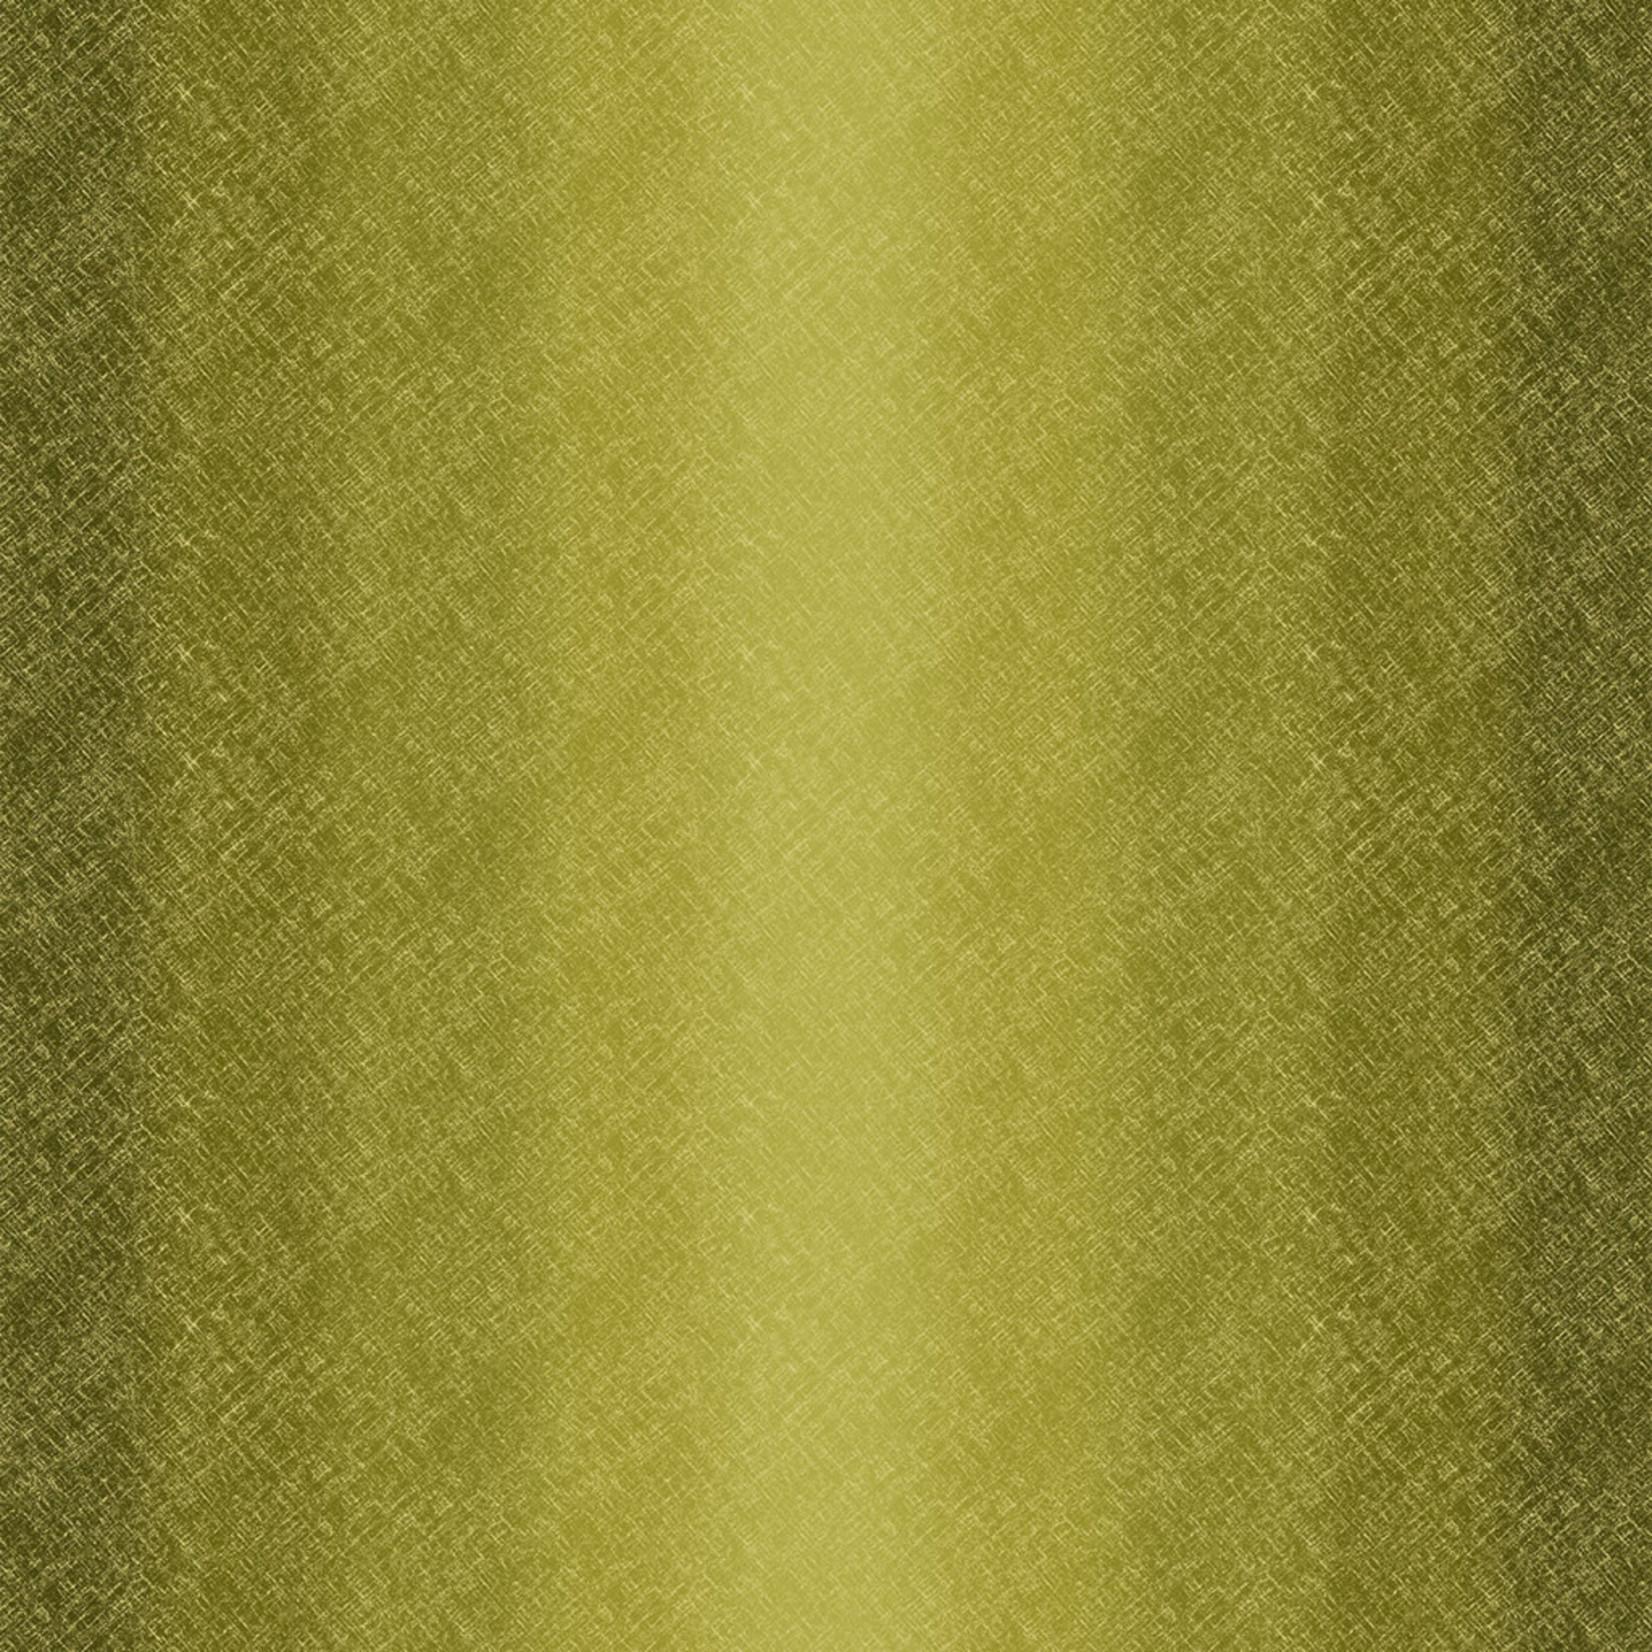 Maywood Studio Bountiful - Gradient - Green